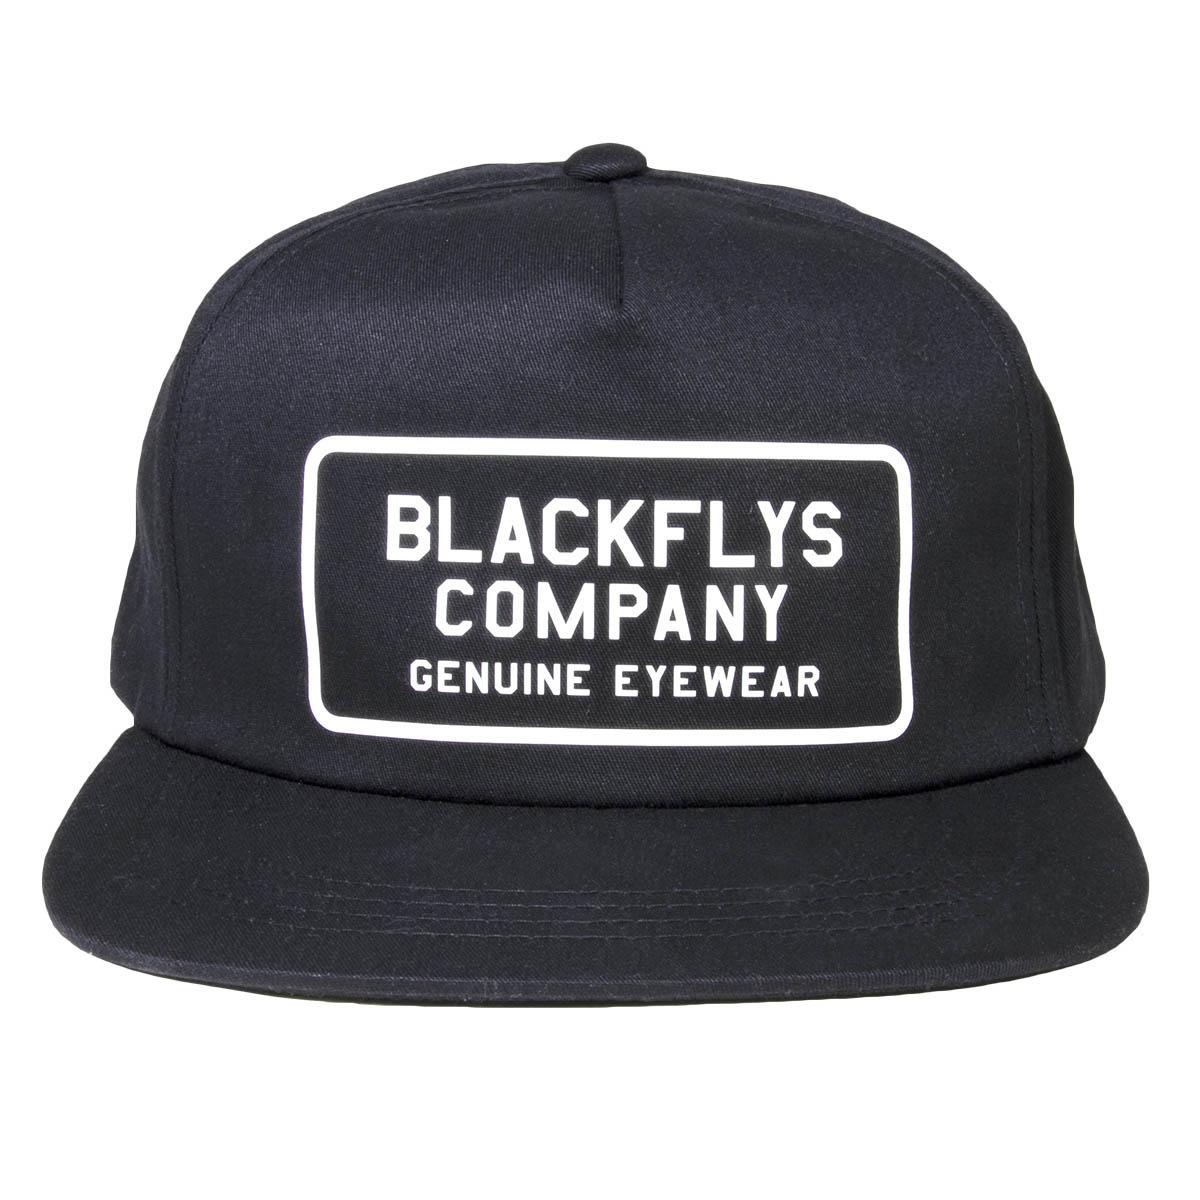 MISSON SNAP BACK CAP